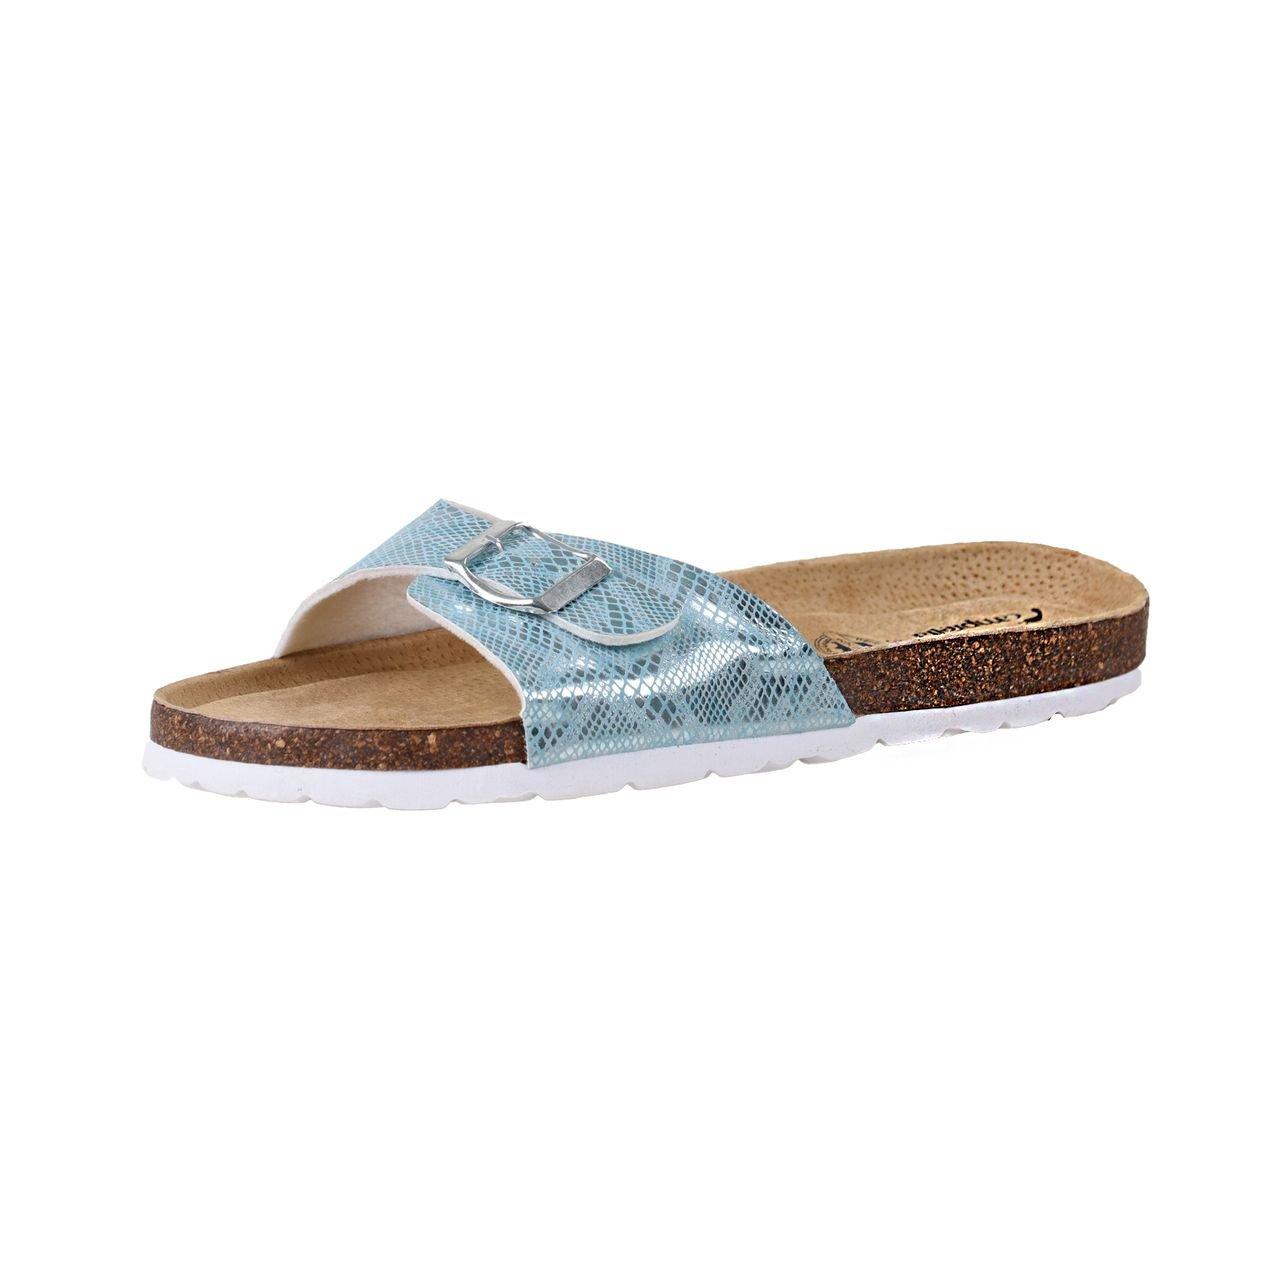 CAMPRELLA Damen Tieffußbett Pantolette Sandalen 1-Schnaller